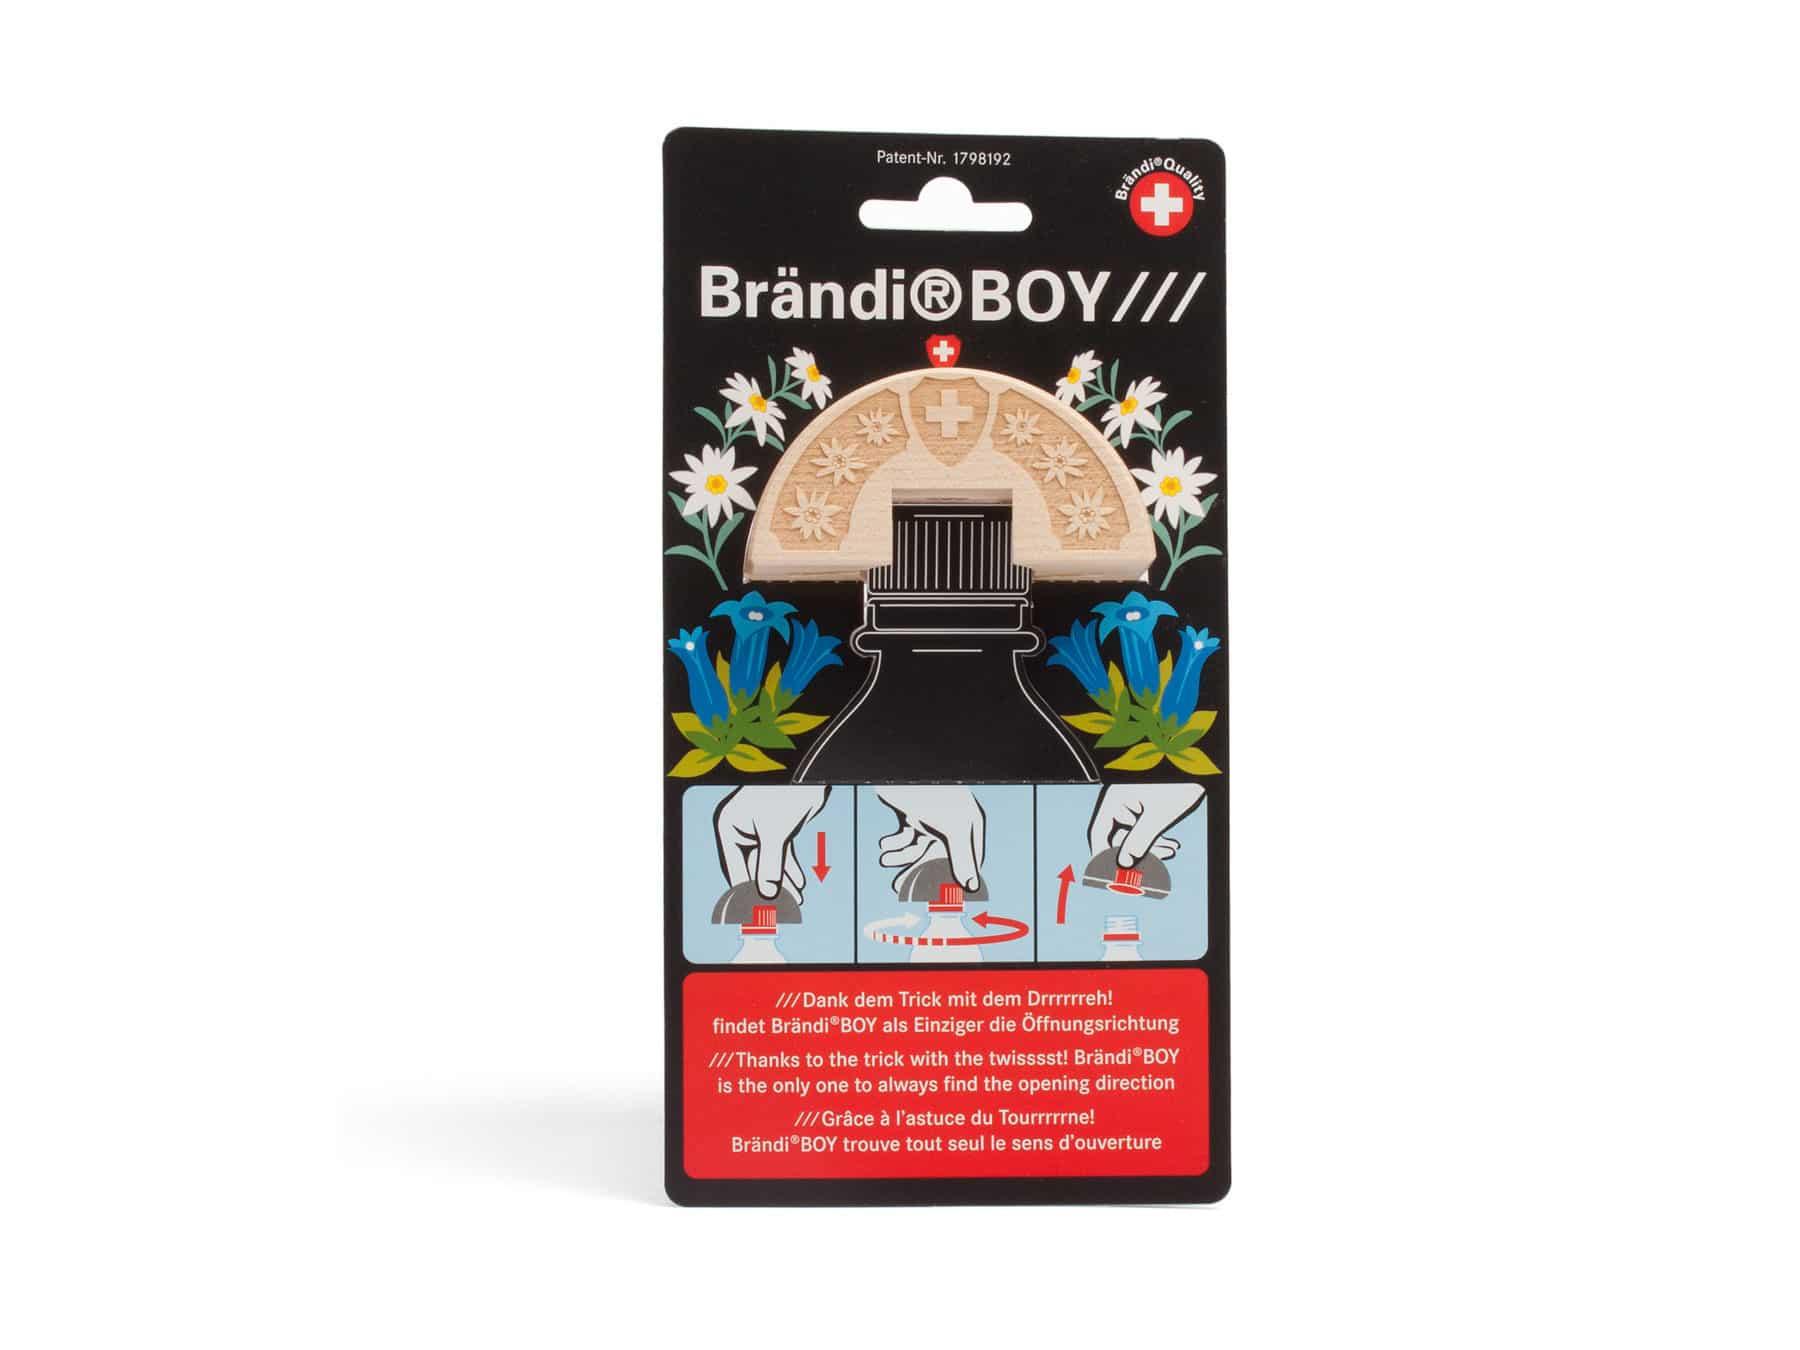 Brändi Boy Schweiz Lasergravur Holz KURTS.ch